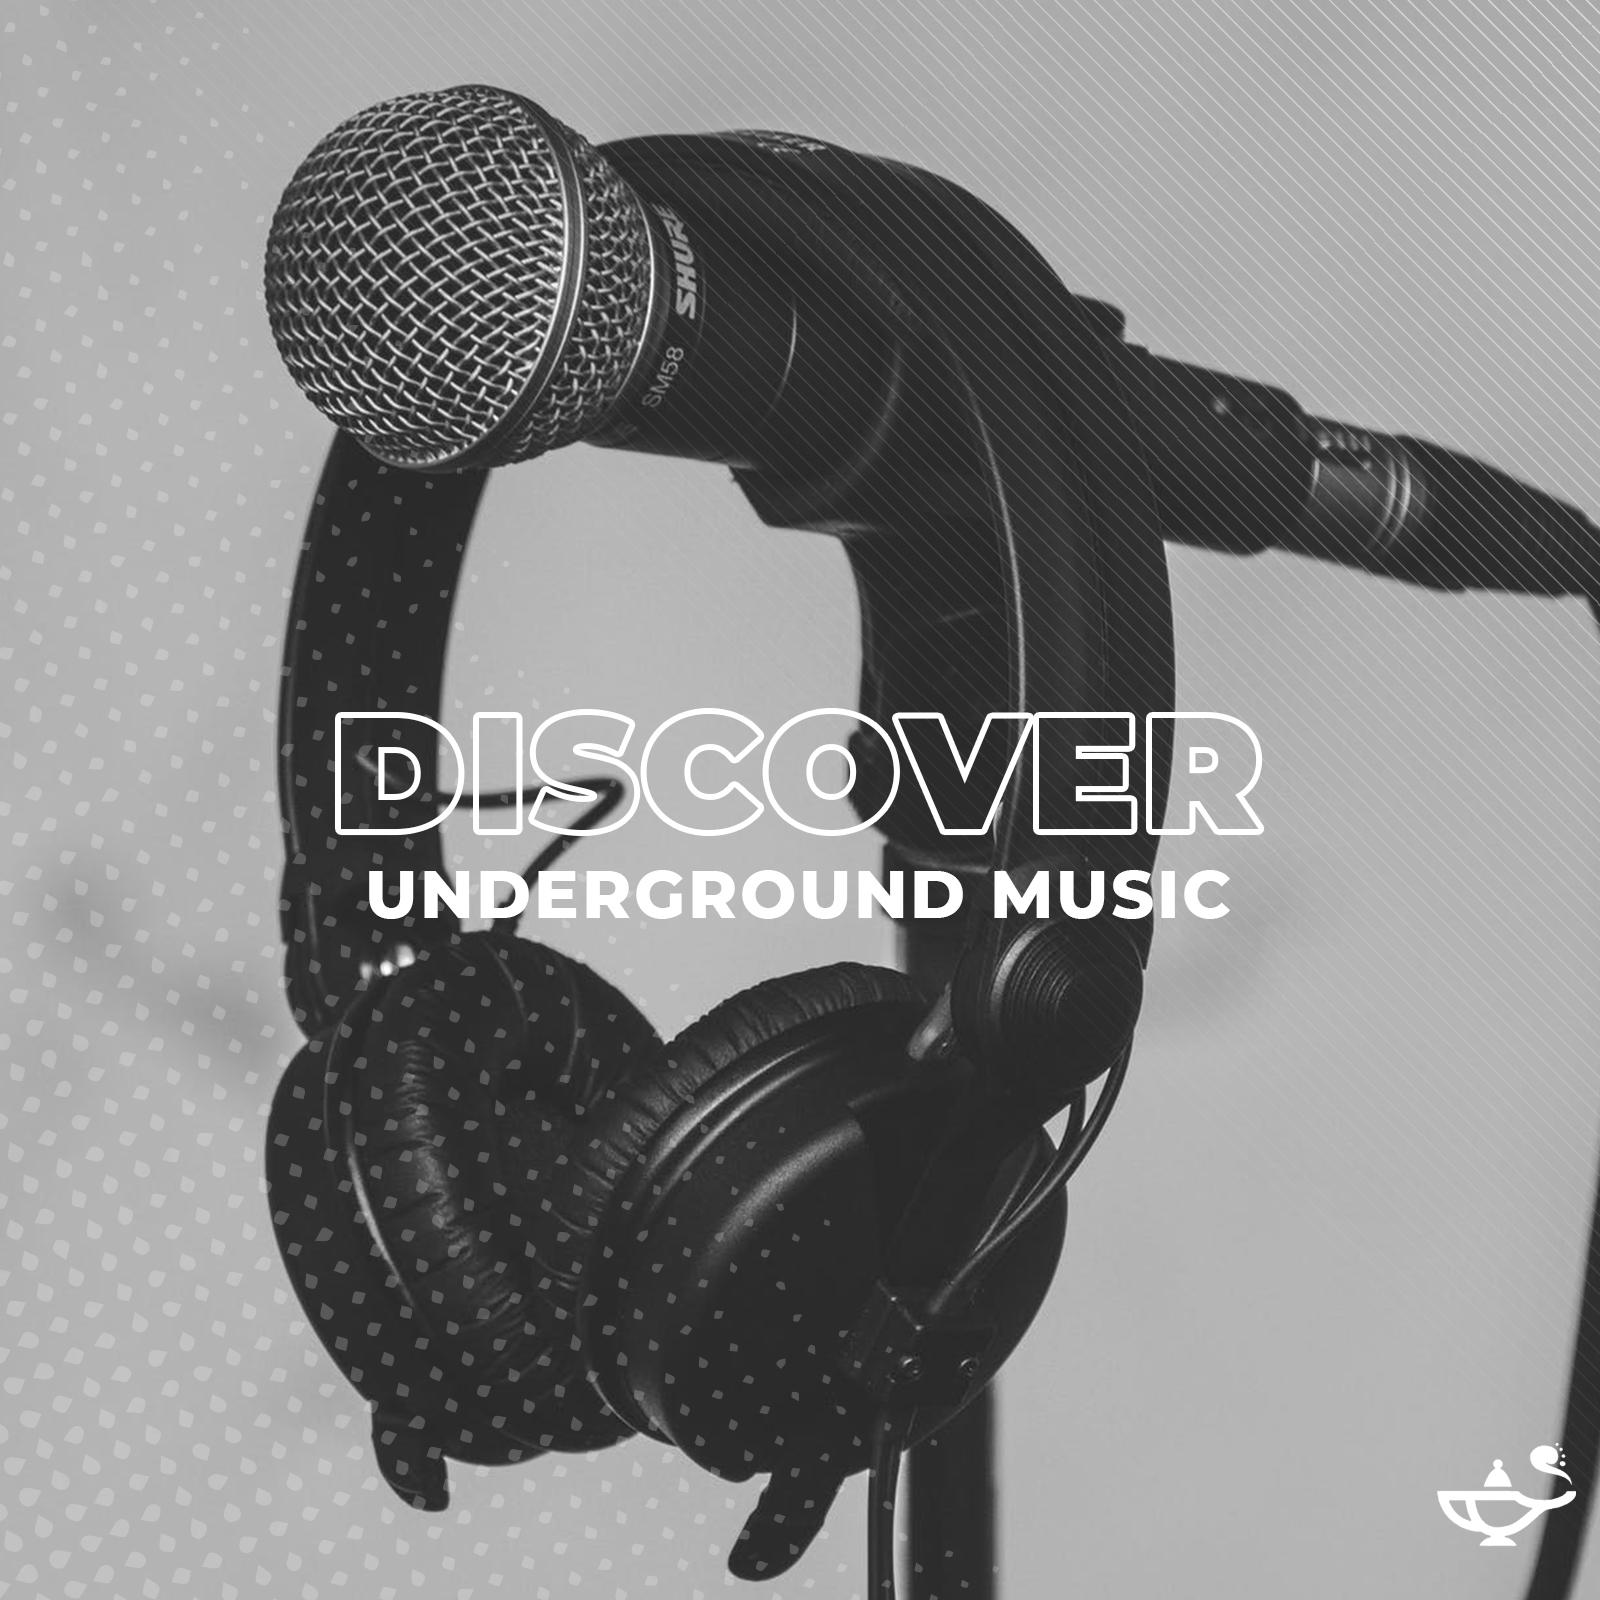 Discover: Underground Music